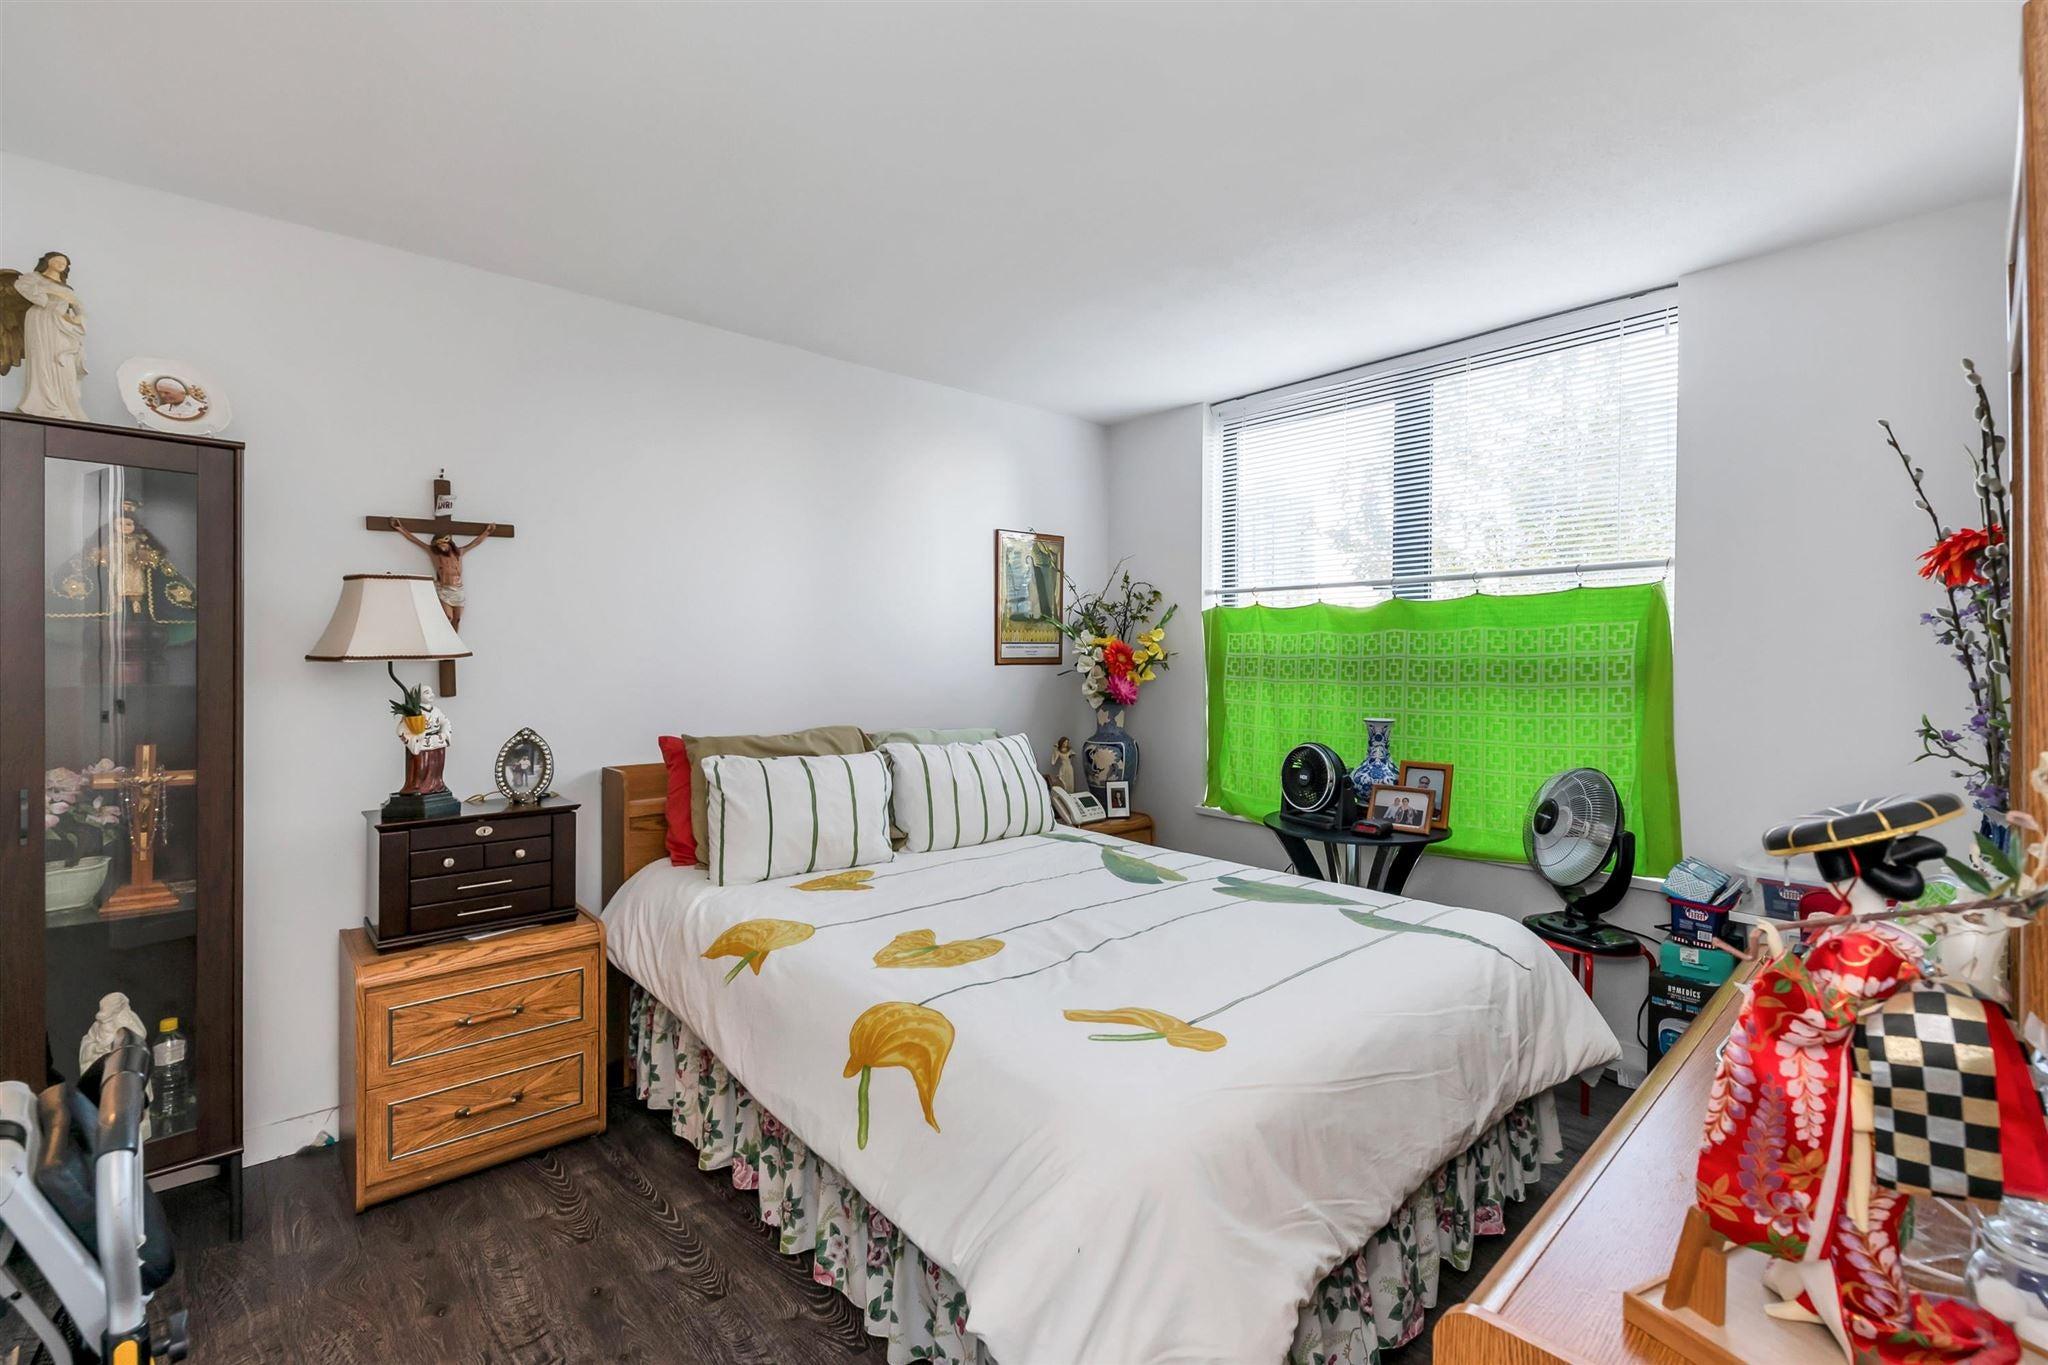 205 7225 ACORN AVENUE - Highgate Apartment/Condo for sale, 2 Bedrooms (R2606454) - #13